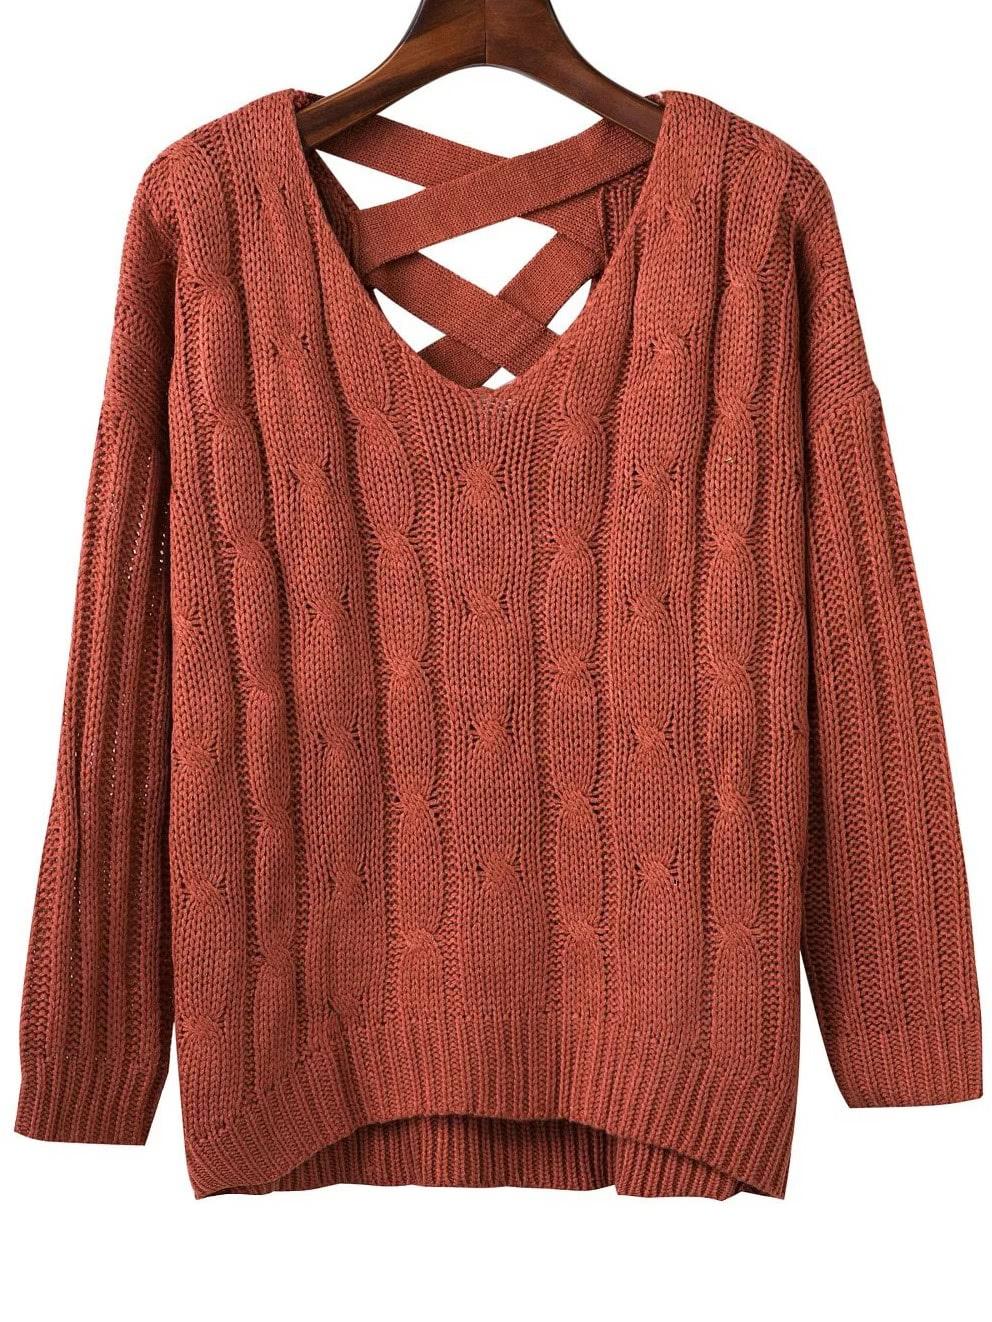 sweater161028218_2